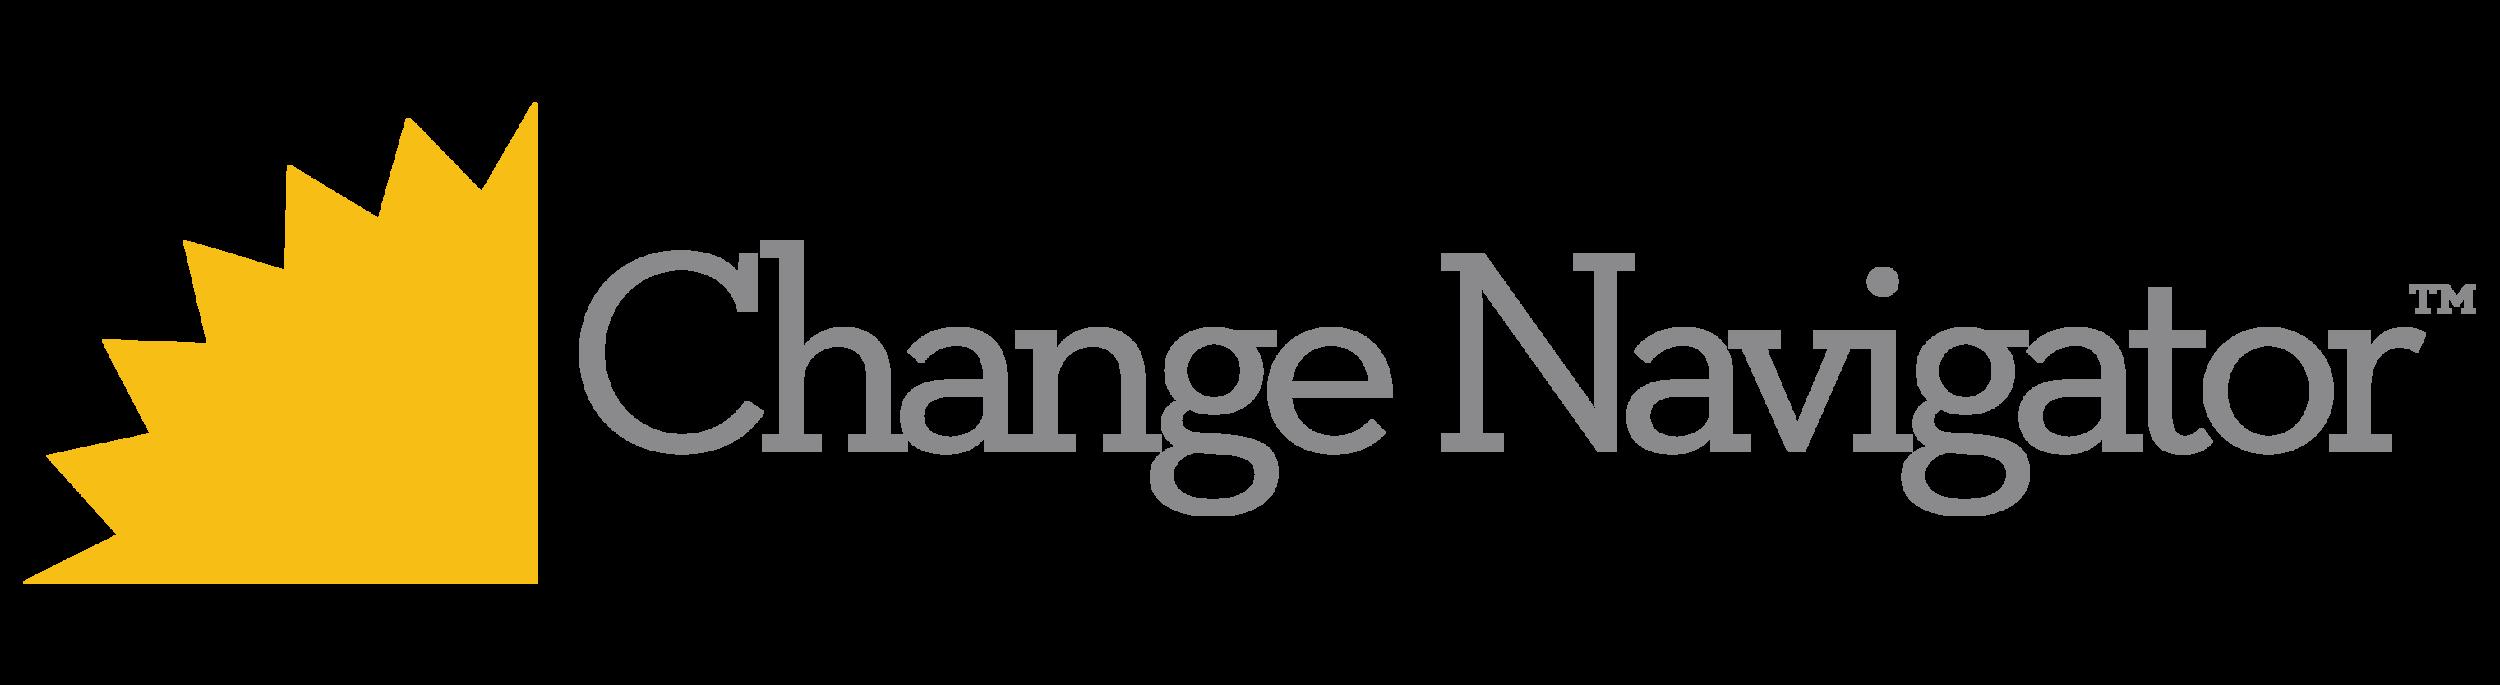 change-nafigator-04.png